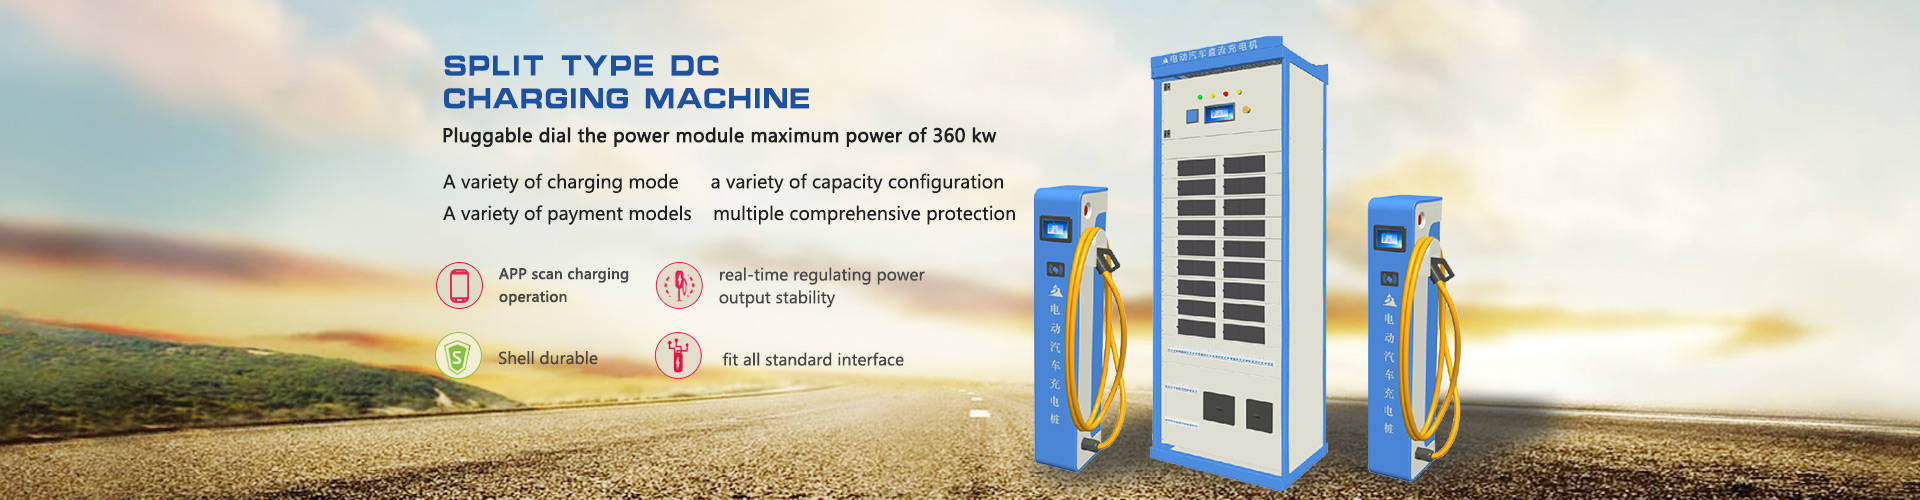 Split type DC charging machine